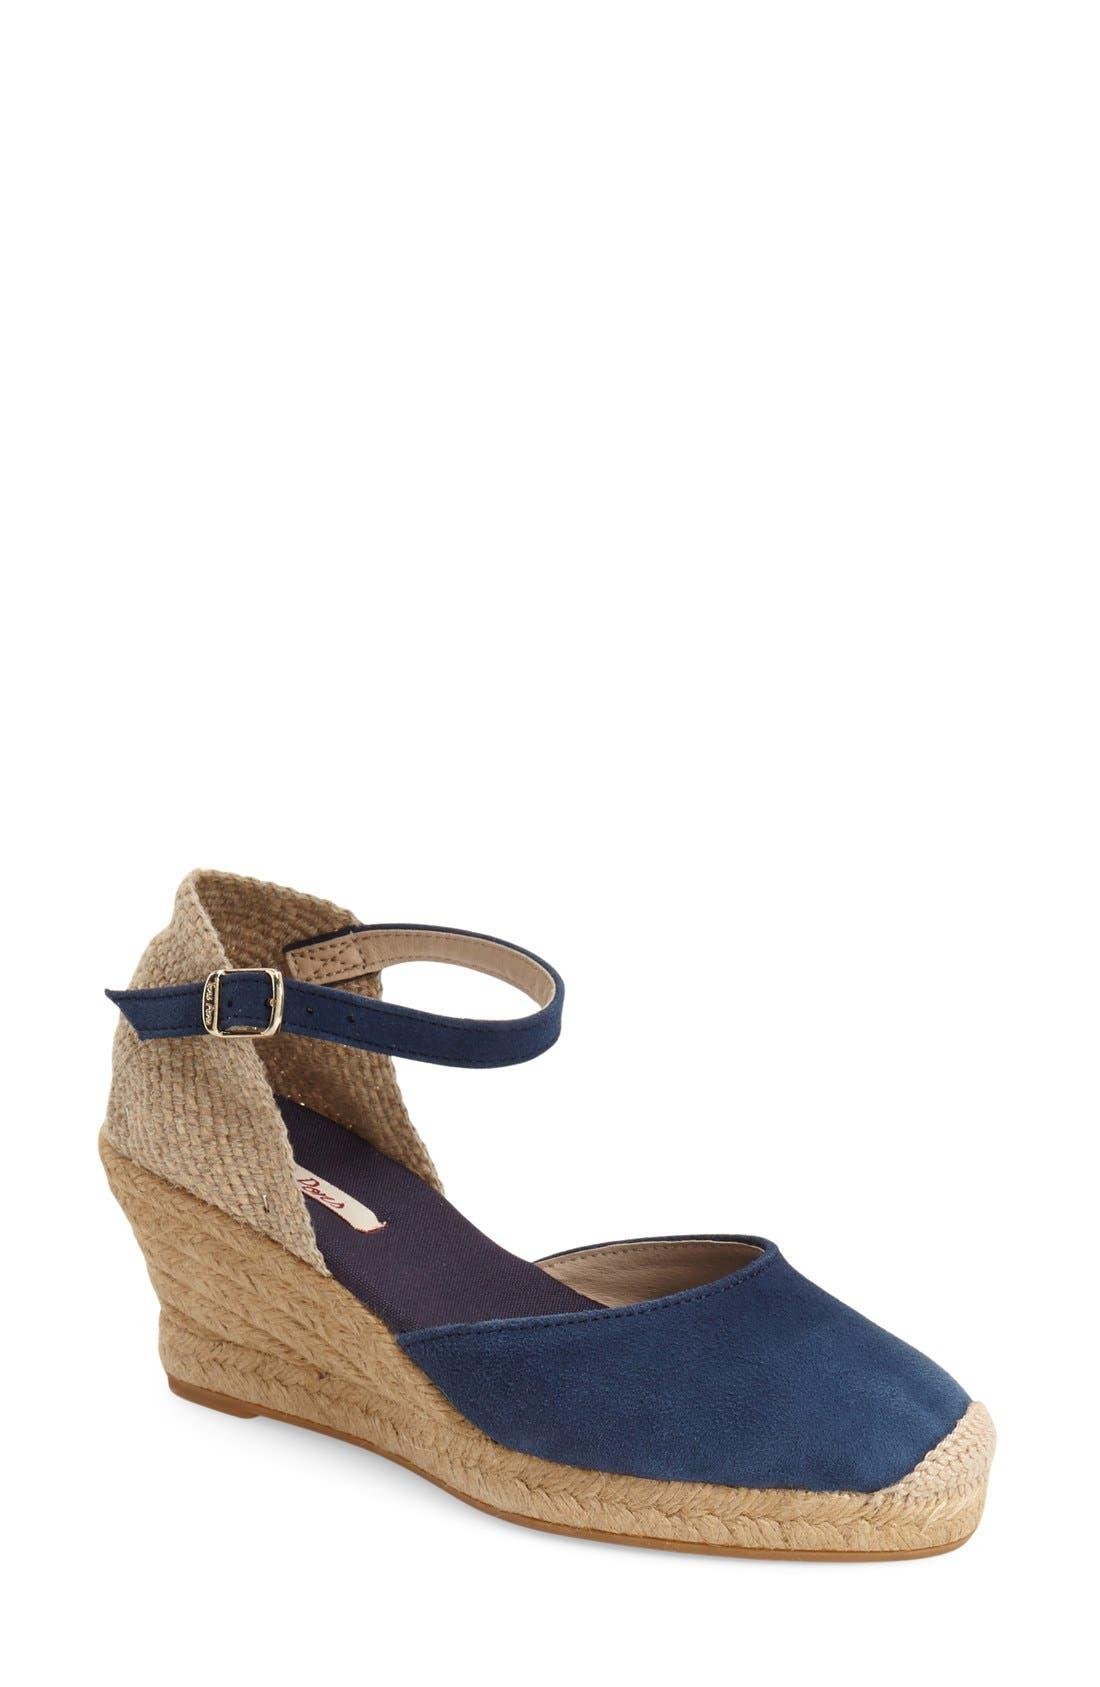 TONI PONS 'Lloret-5' Espadrille Wedge Sandal, Main, color, NAVY SUEDE